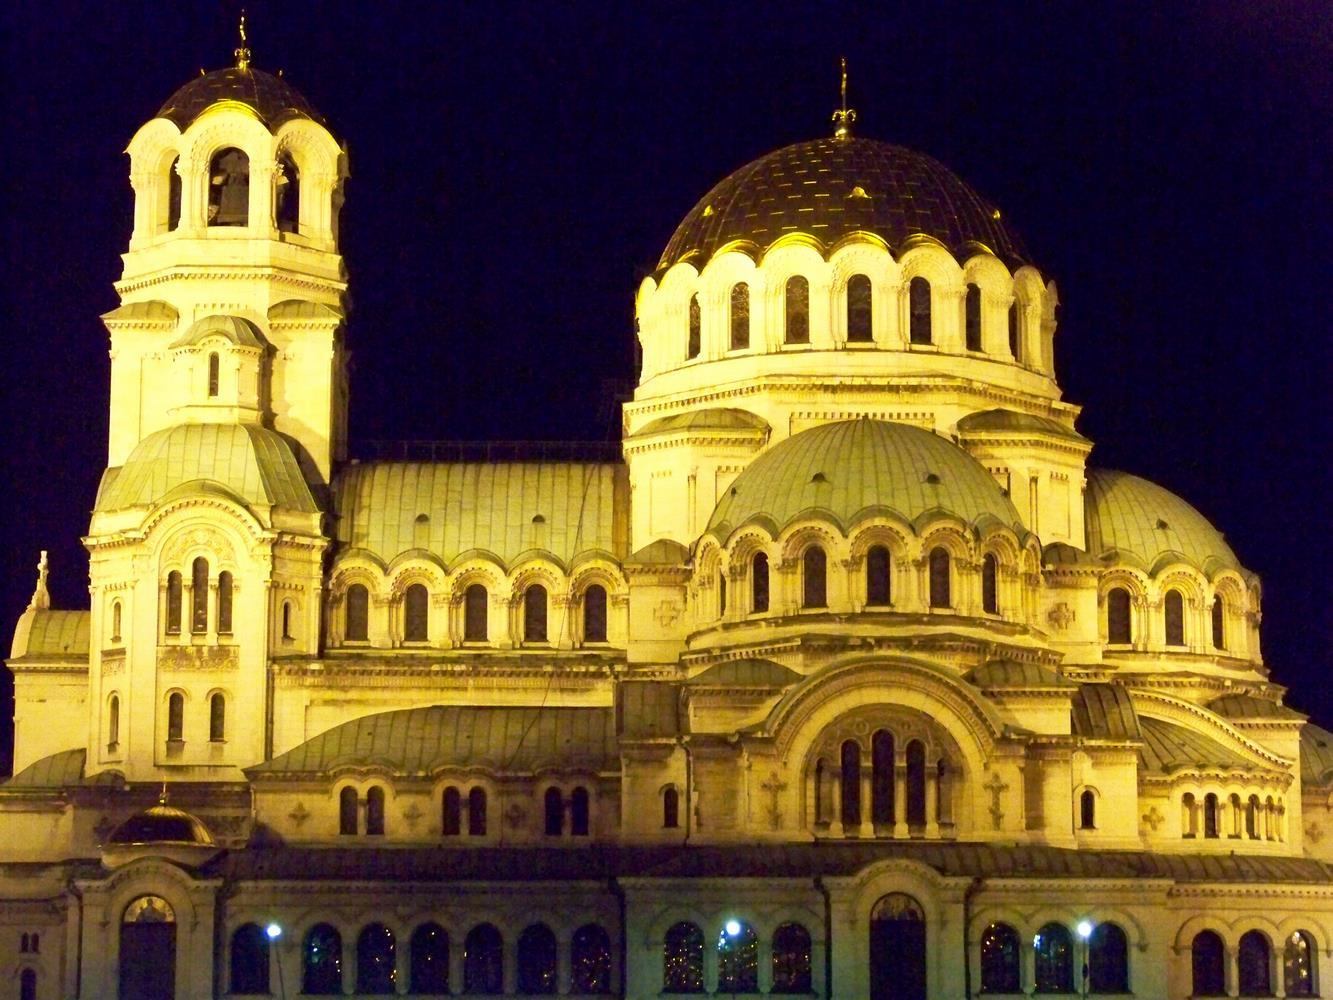 کلیسای جامع الکساندر نوسکی صوفیه بلغارستان